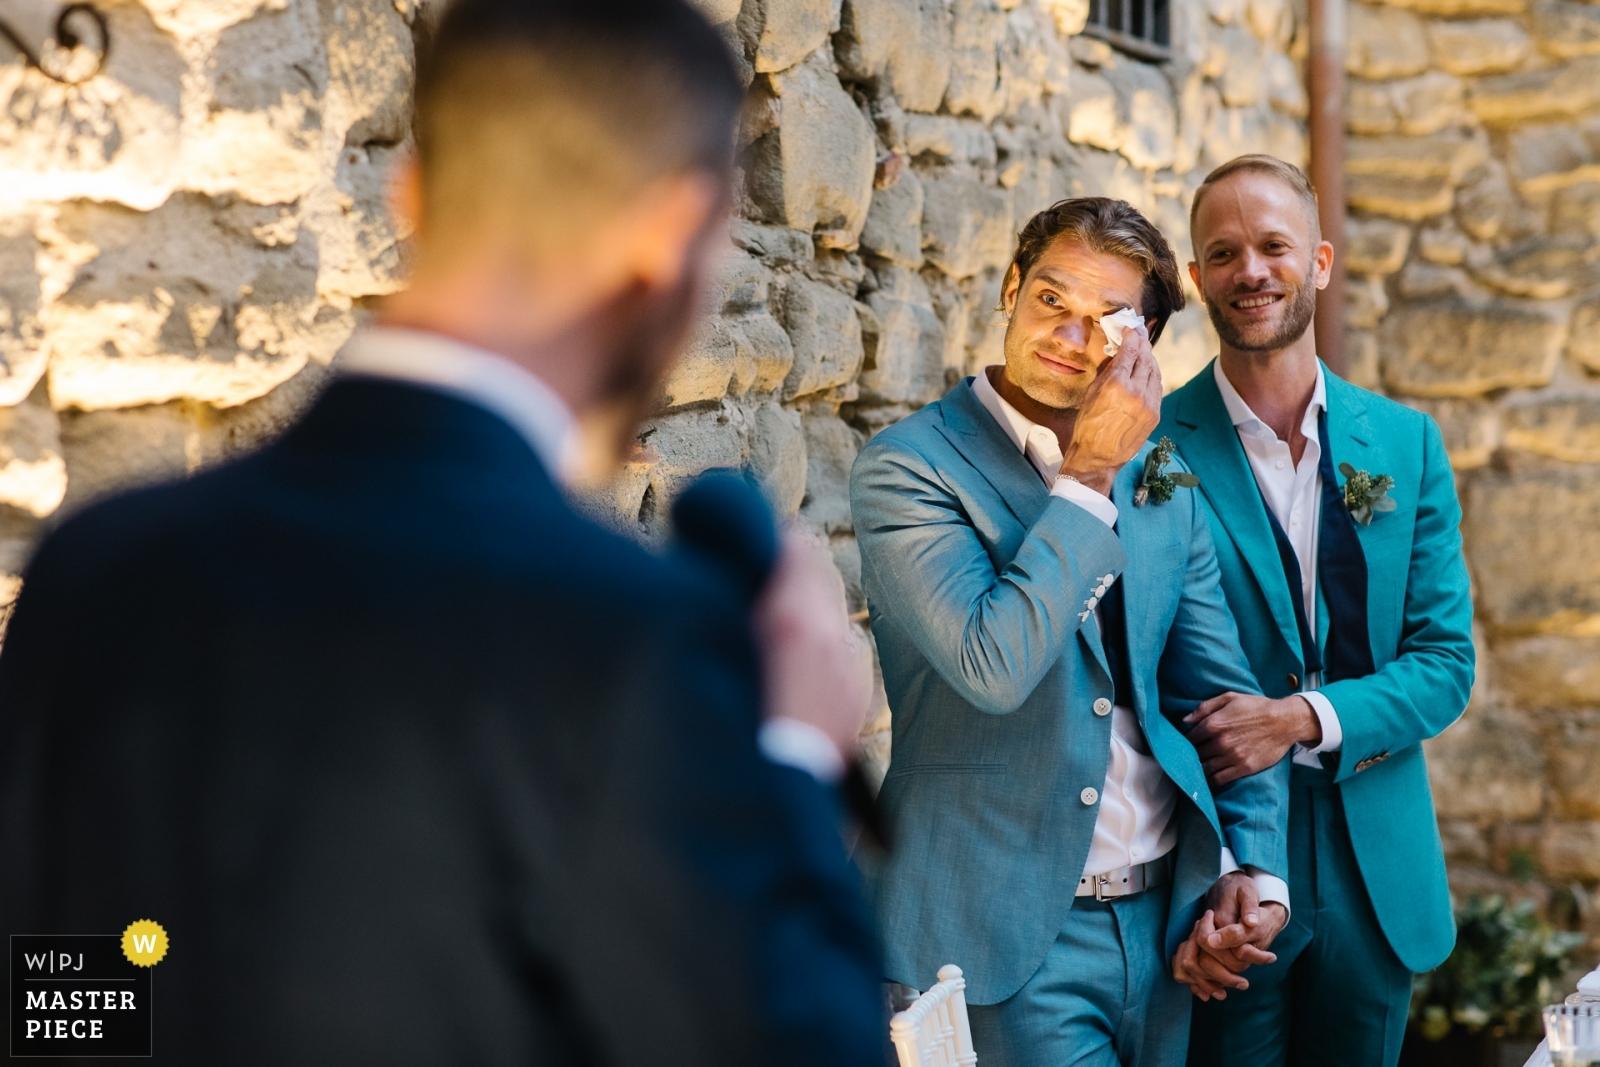 Grooms during speech - Portofino, Genoa Wedding Photography -  | Castello di Rosciano, Umbria, Italy